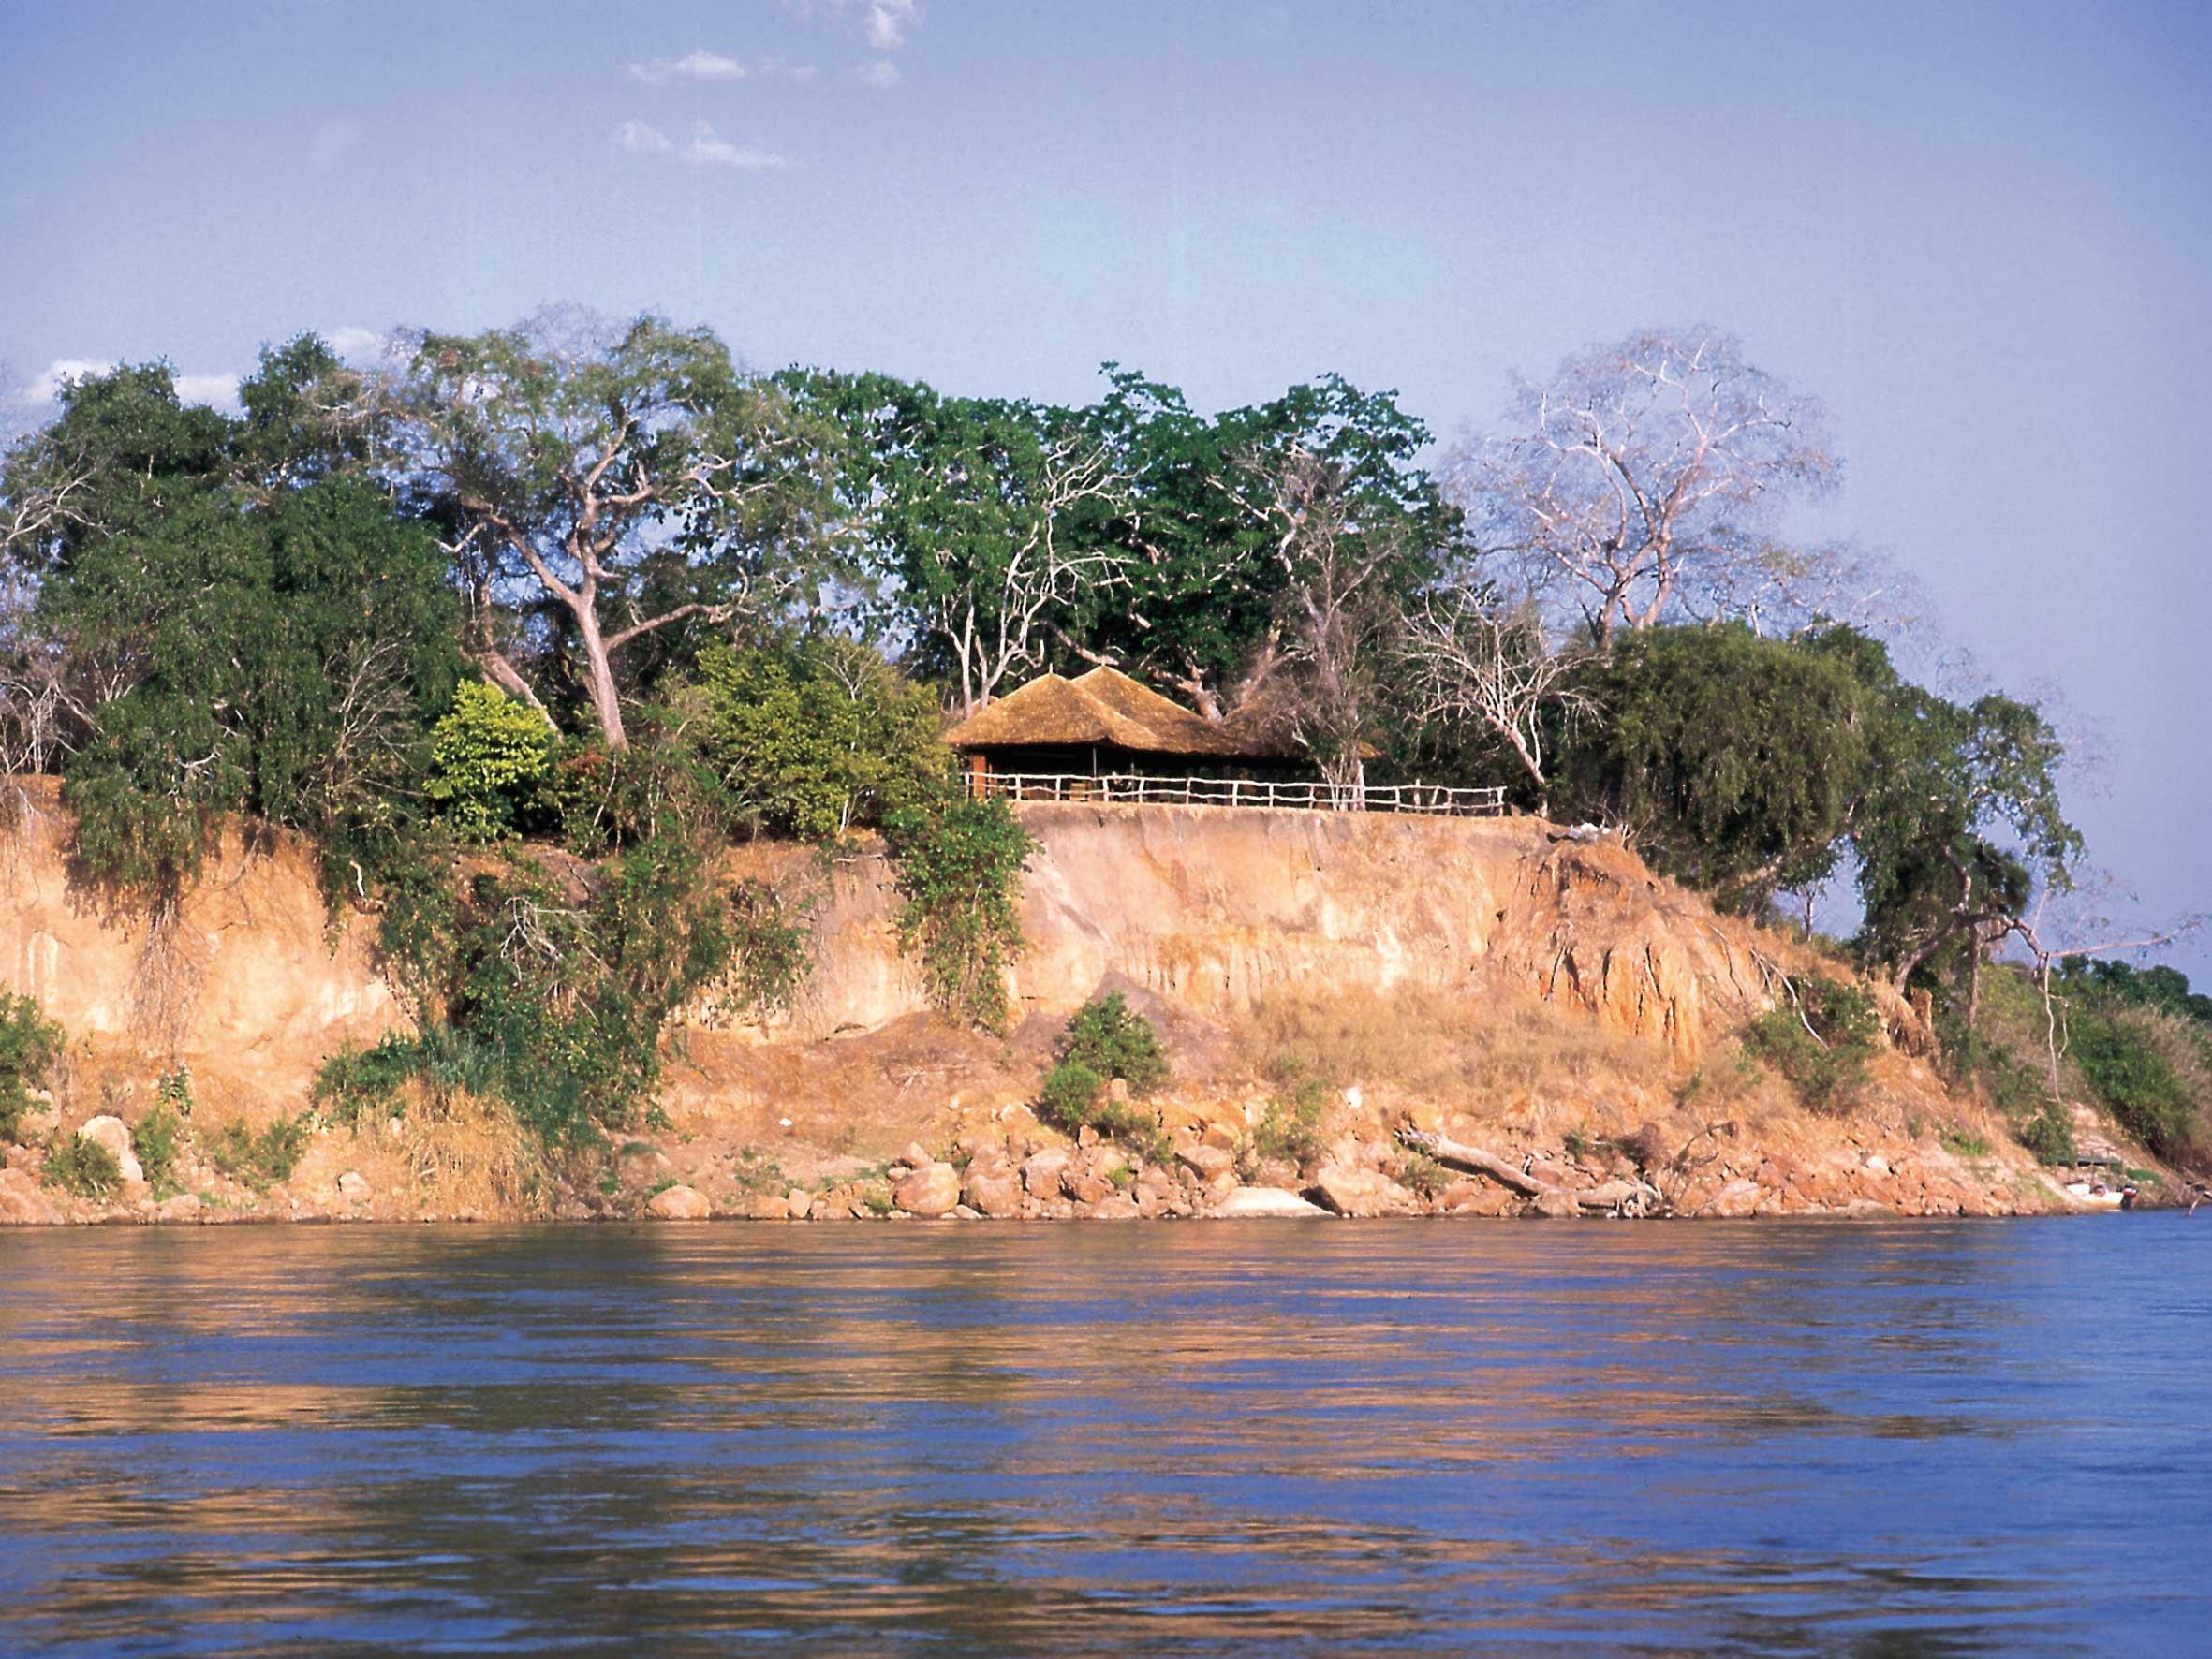 rufiji-river-camp-6